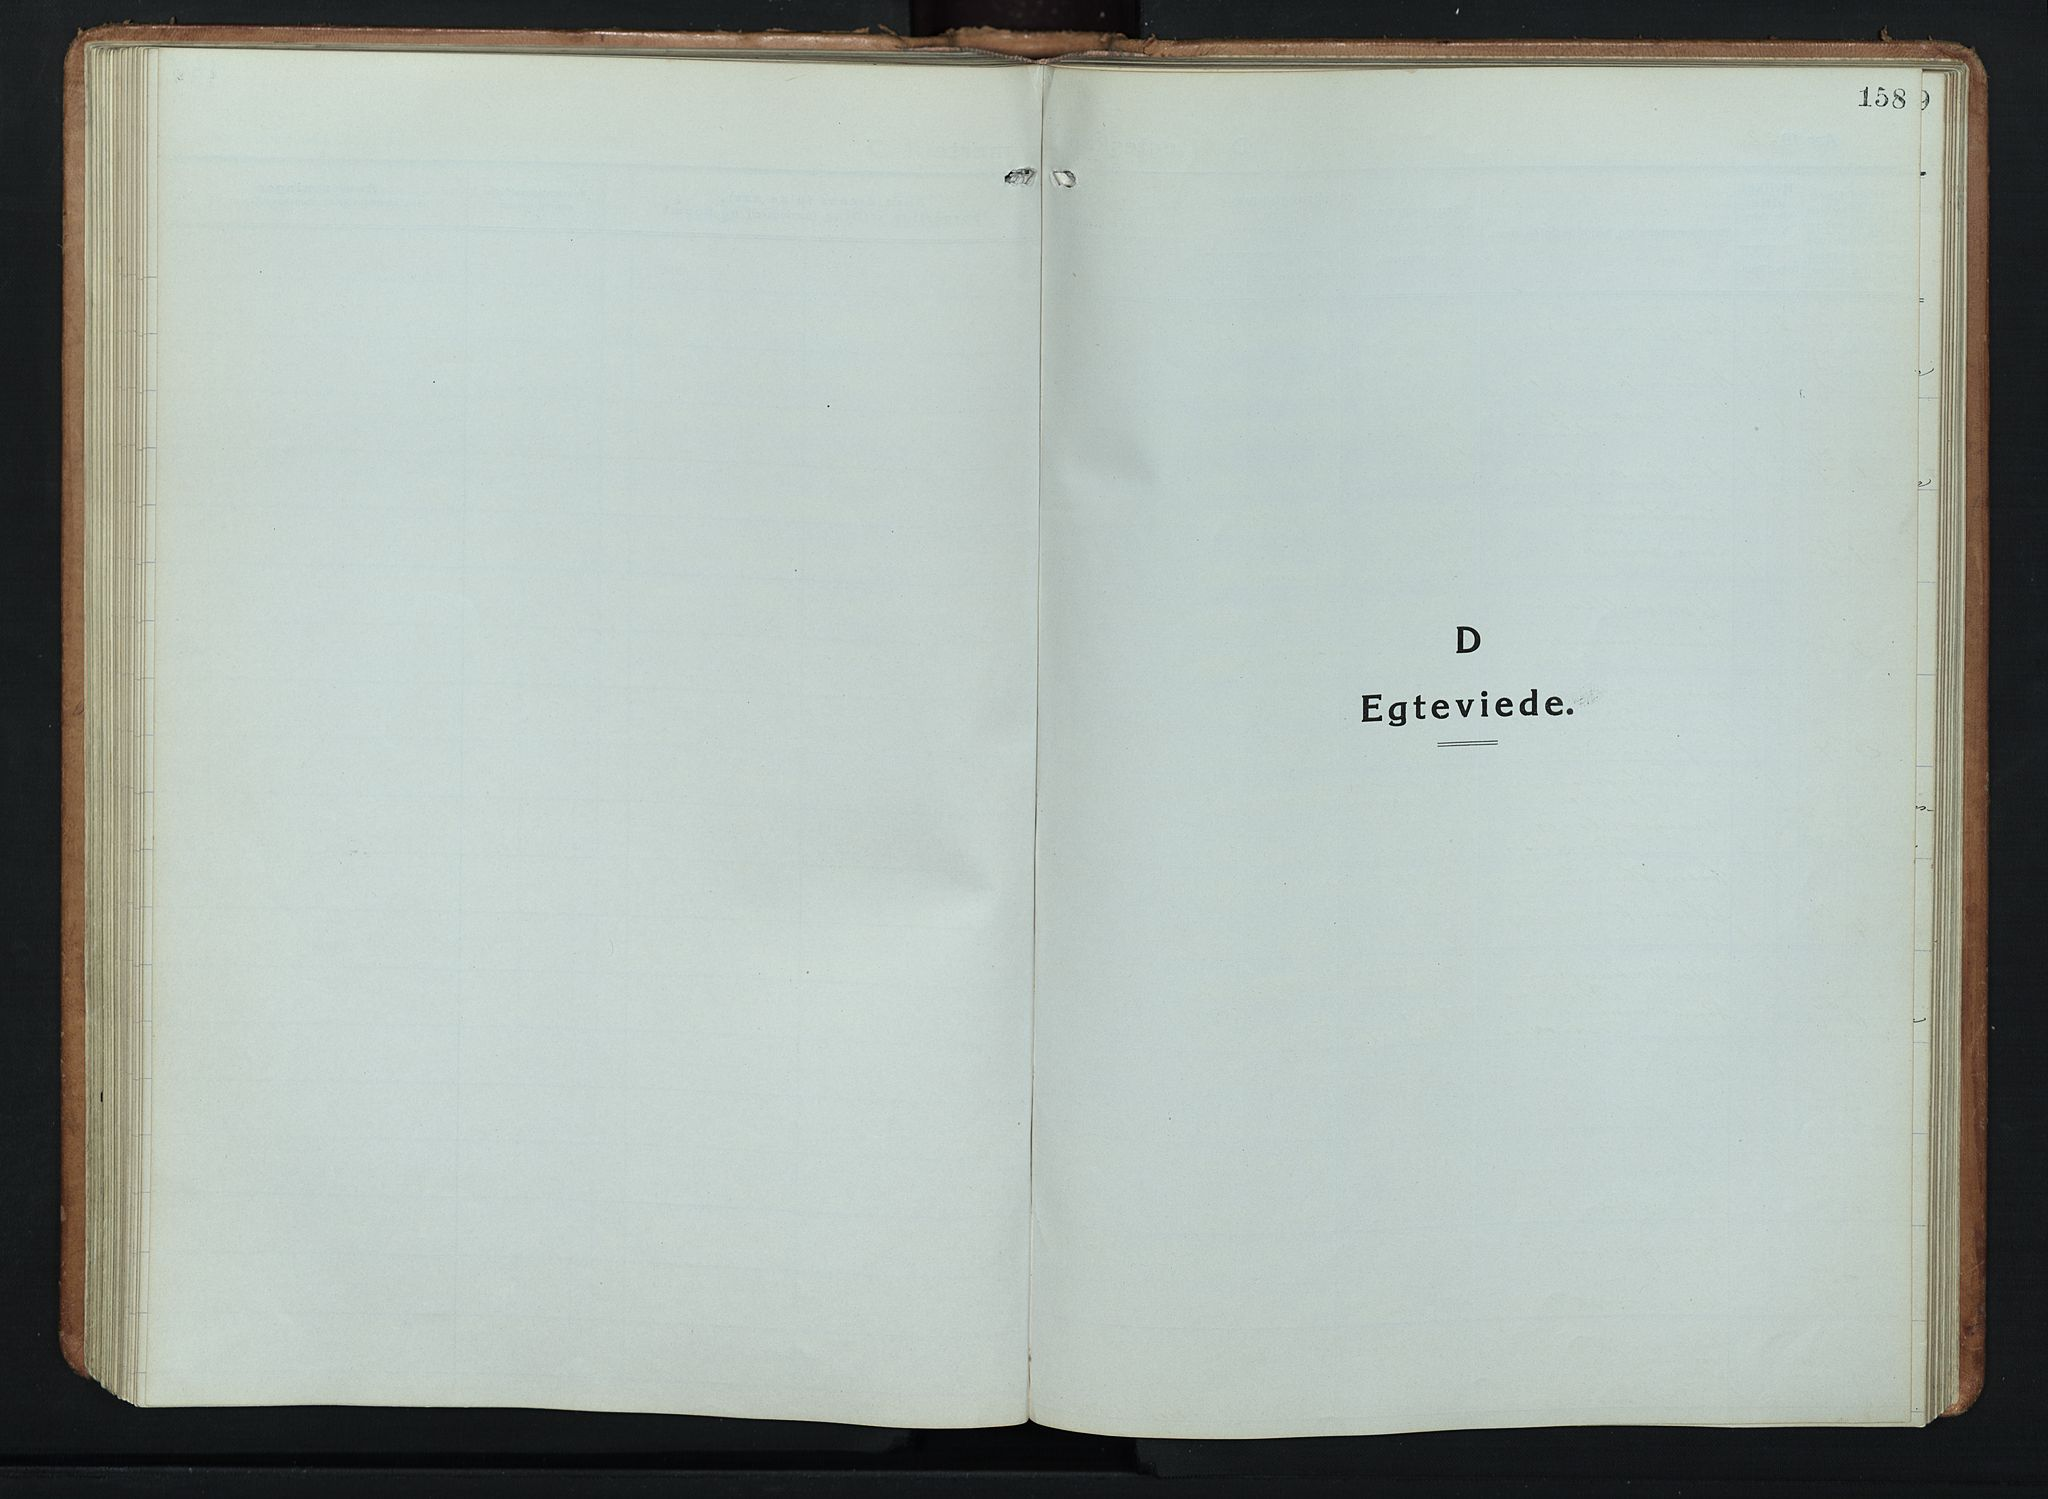 SAH, Ringebu prestekontor, Klokkerbok nr. 11, 1921-1943, s. 158